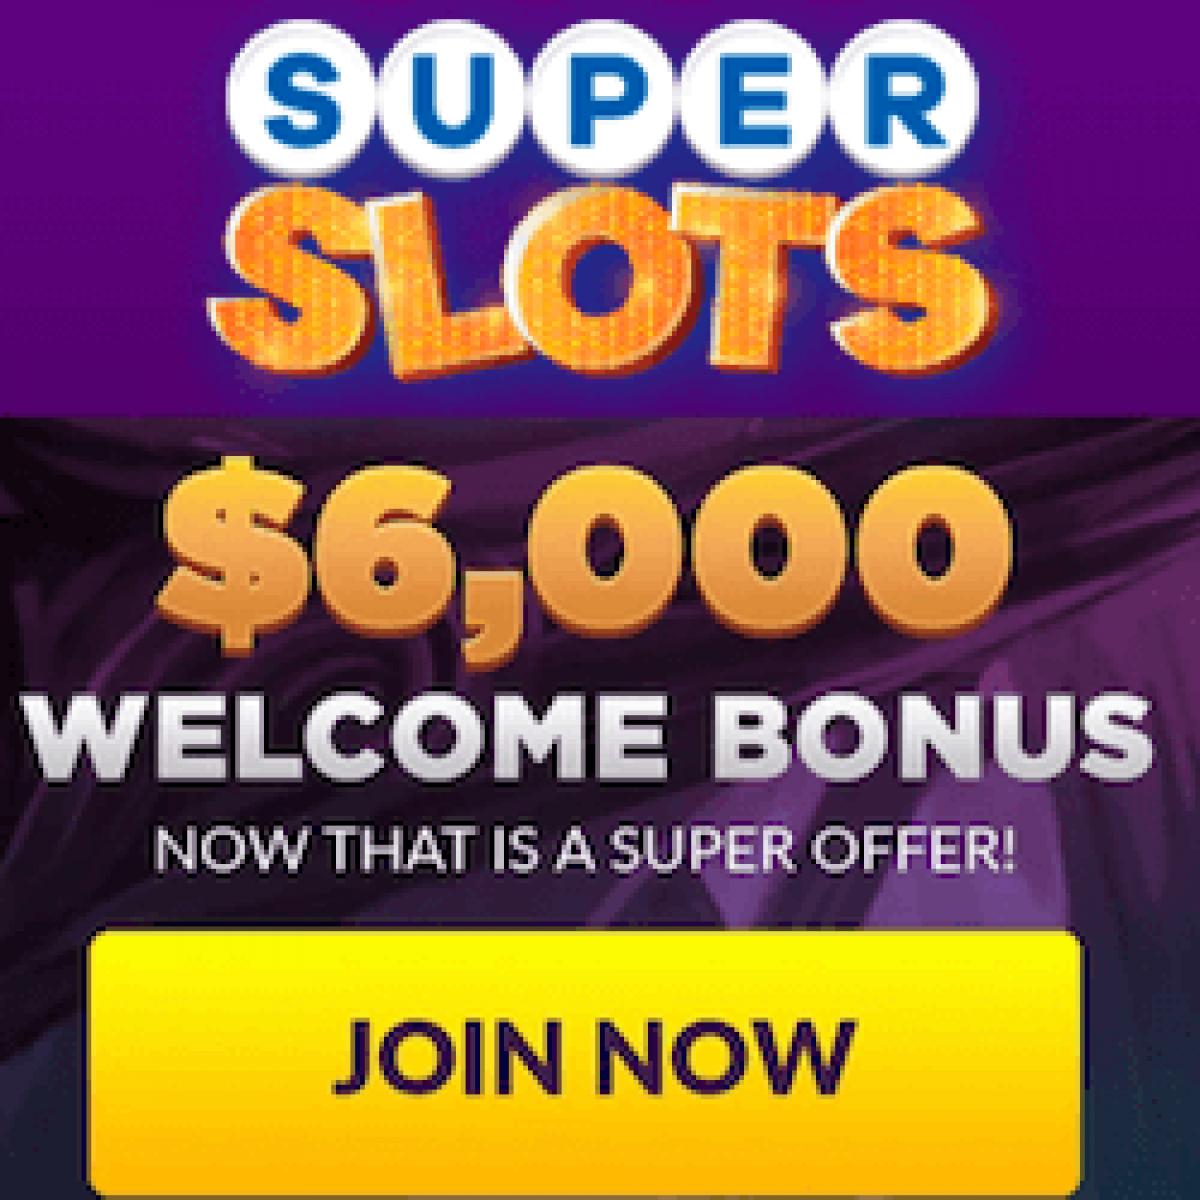 Super Slots Casino 300 Deposit Match Bonus Up To 00